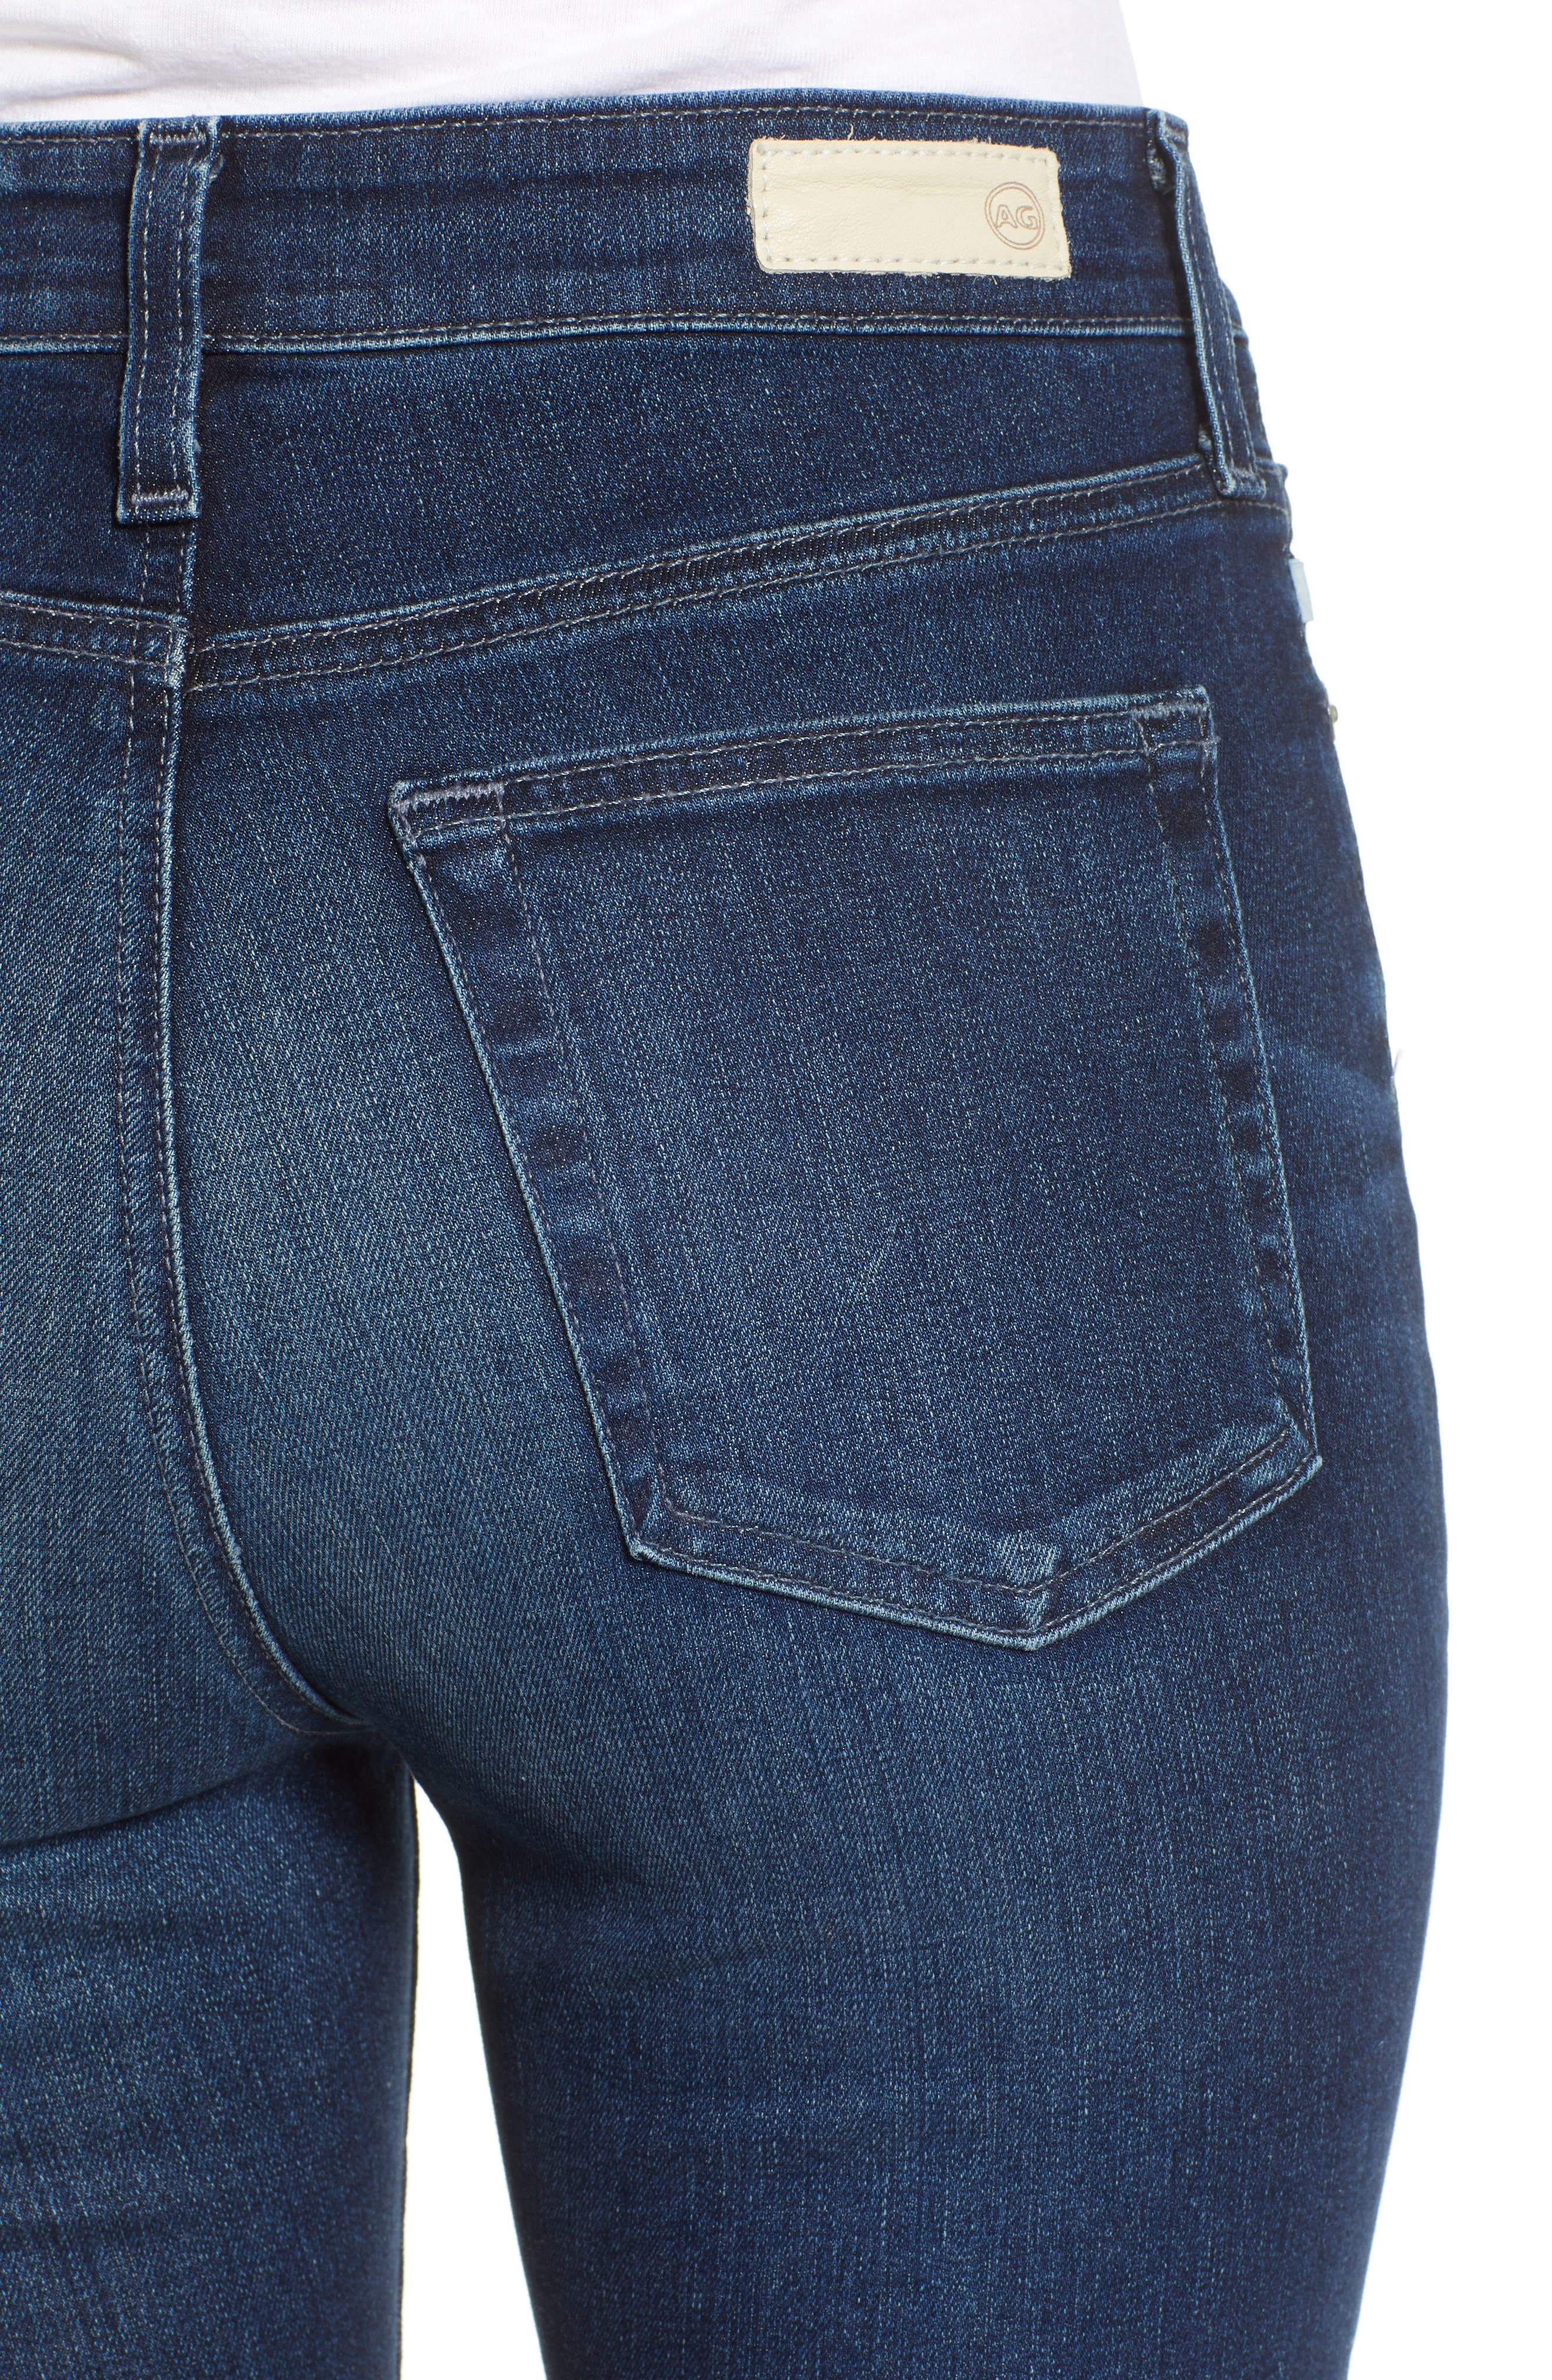 Mila Ankle Skinny Jeans,                             Alternate thumbnail 4, color,                             402